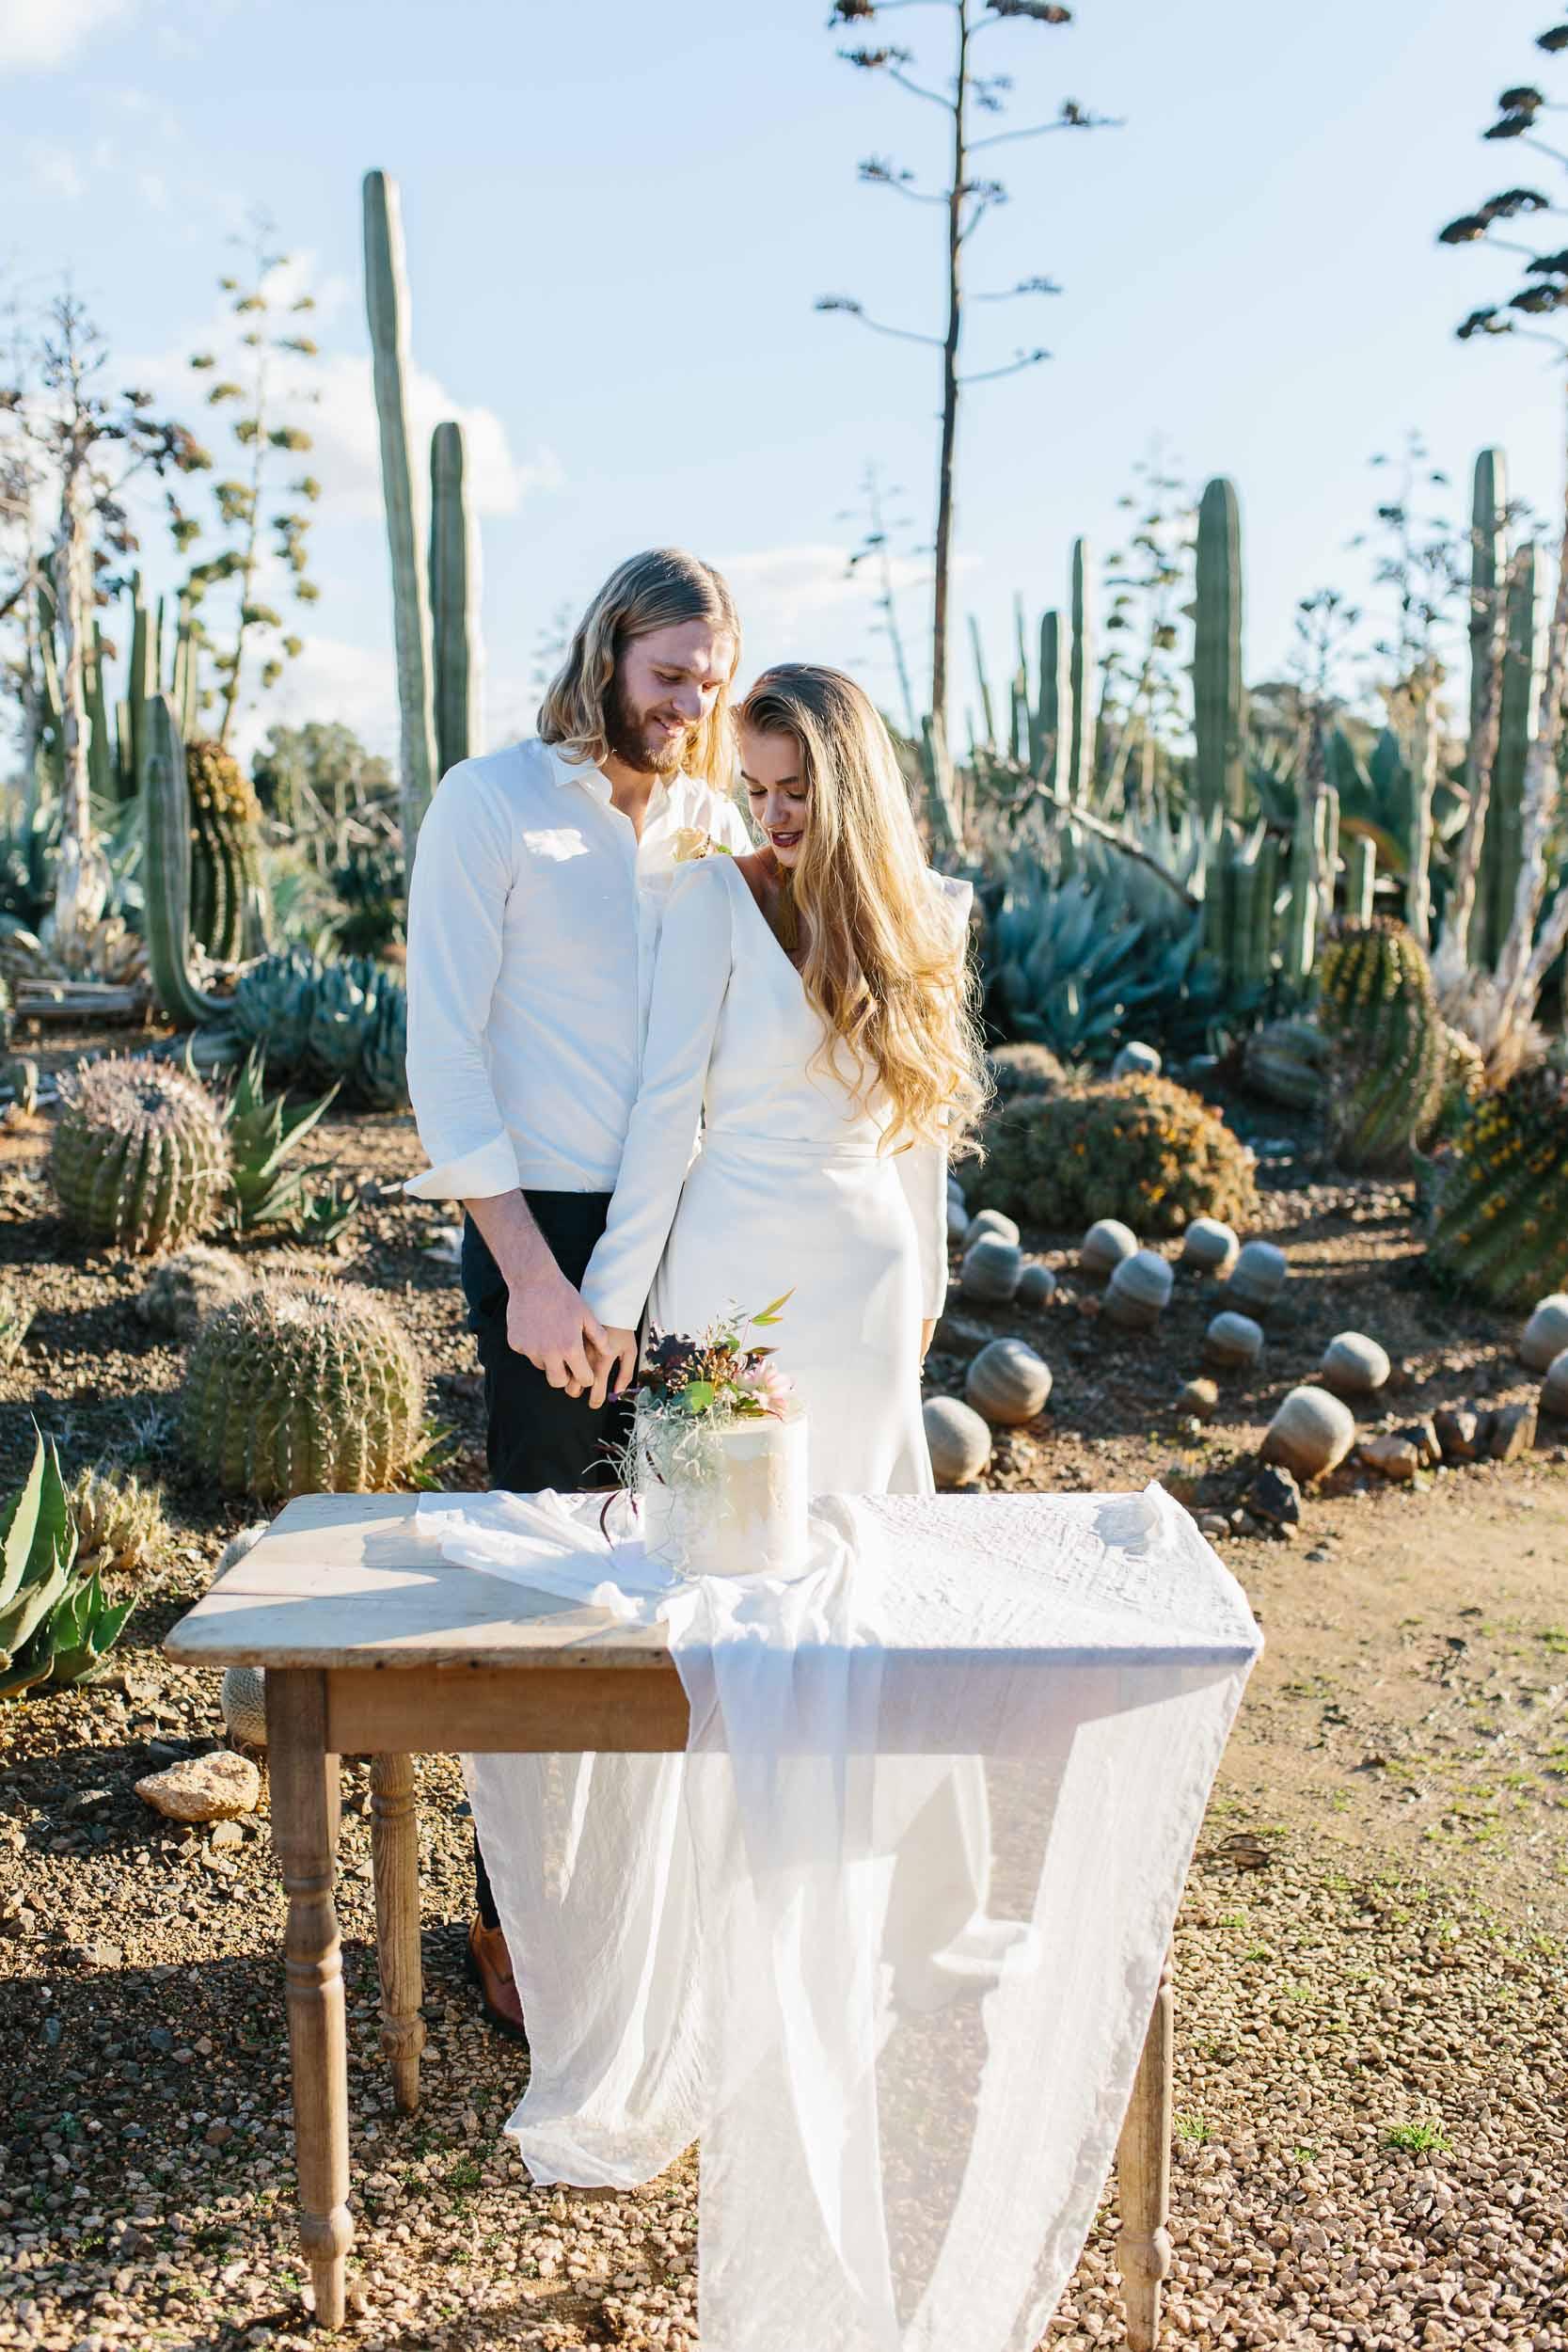 Kas-Richards-Ruby-and-James-Stylist-Cactus-Country-Karen-Willis-Holmes-Bridal-One-Heart-Studios-Boho-Wedding-24.jpg